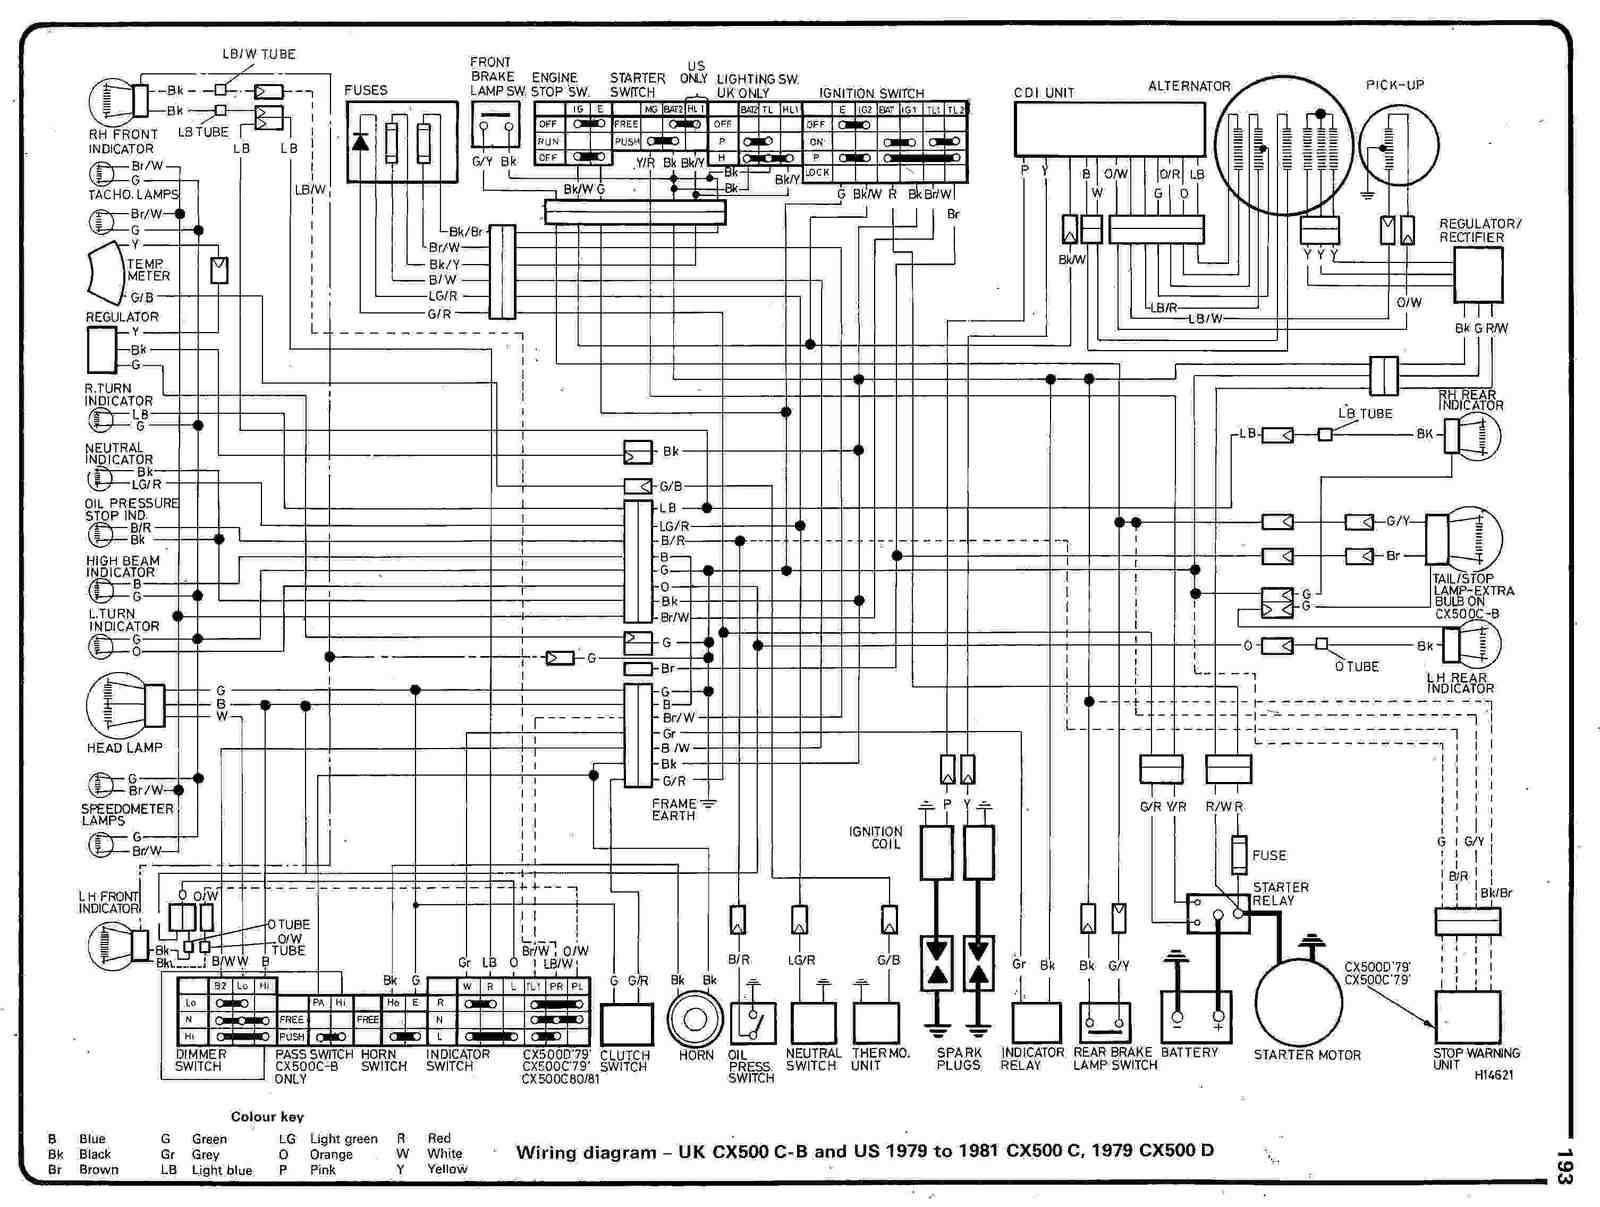 Mercedes G550 Wiring Diagram Sample Schematics Height Off Floor Tail Light Diagramg U2022 Highcare Asia Nissan